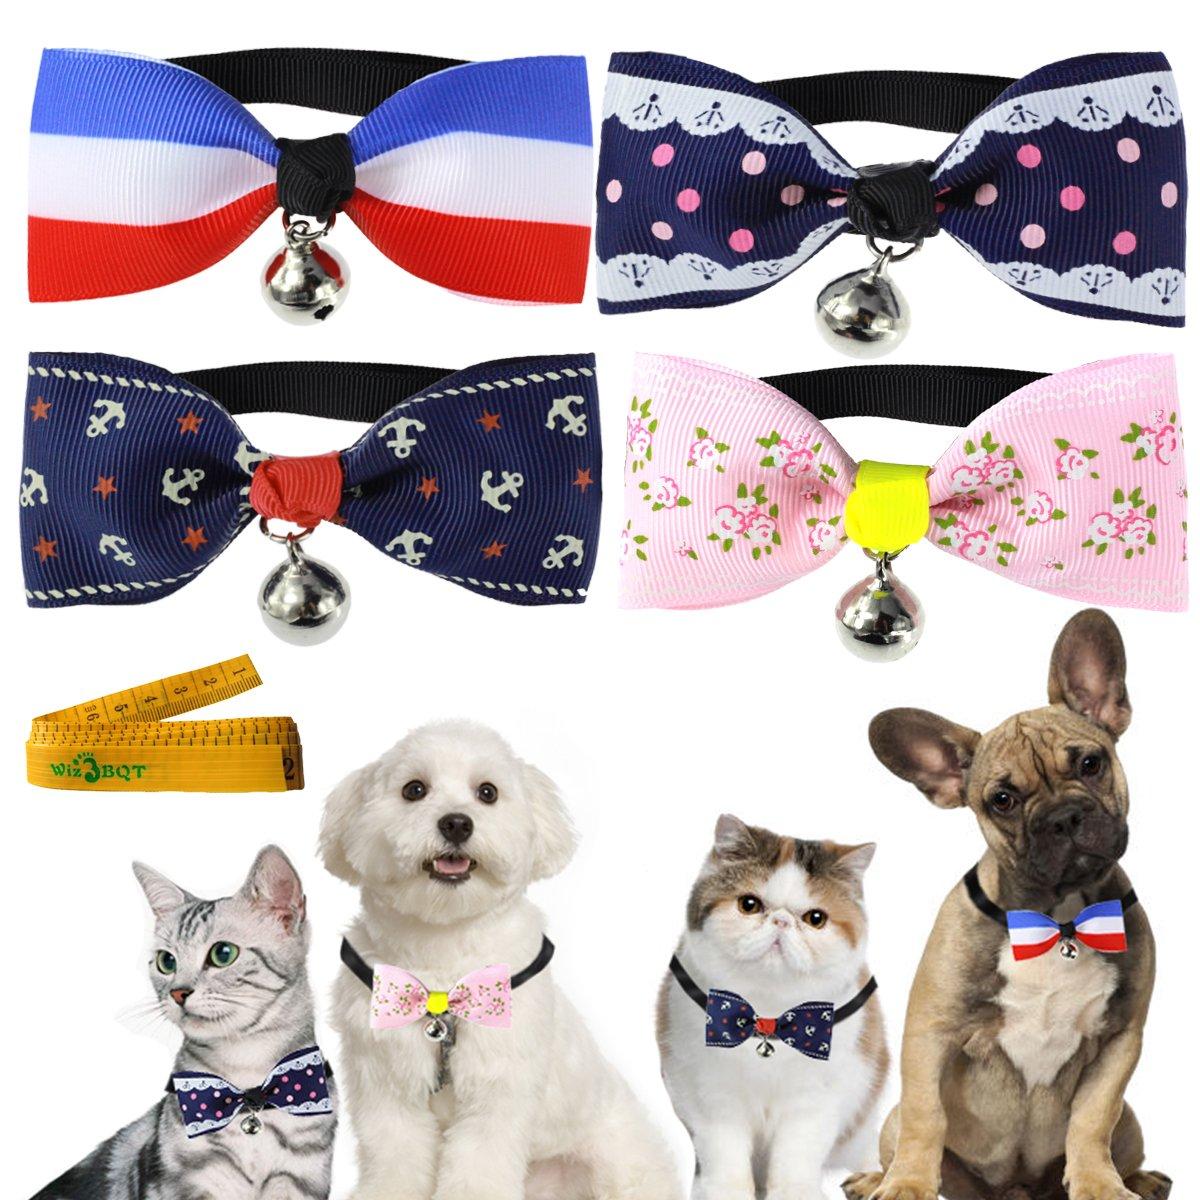 Amazon.com : Pet Cat Dog Rabbit Collar with Bow tie Cloth Bowknot ...